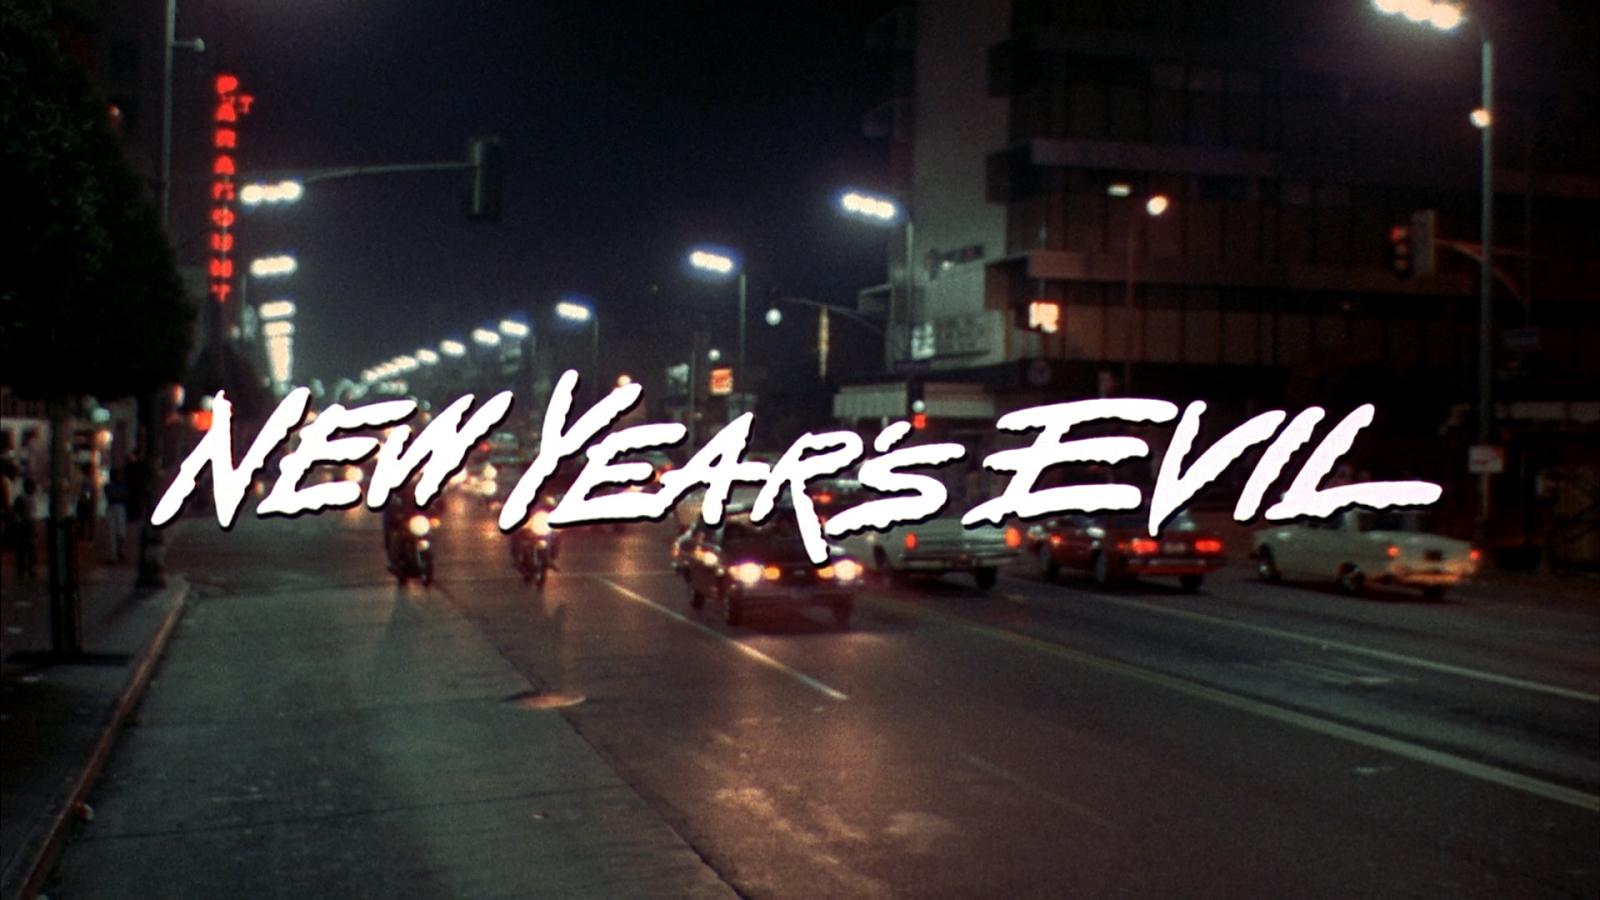 News New Years Eve